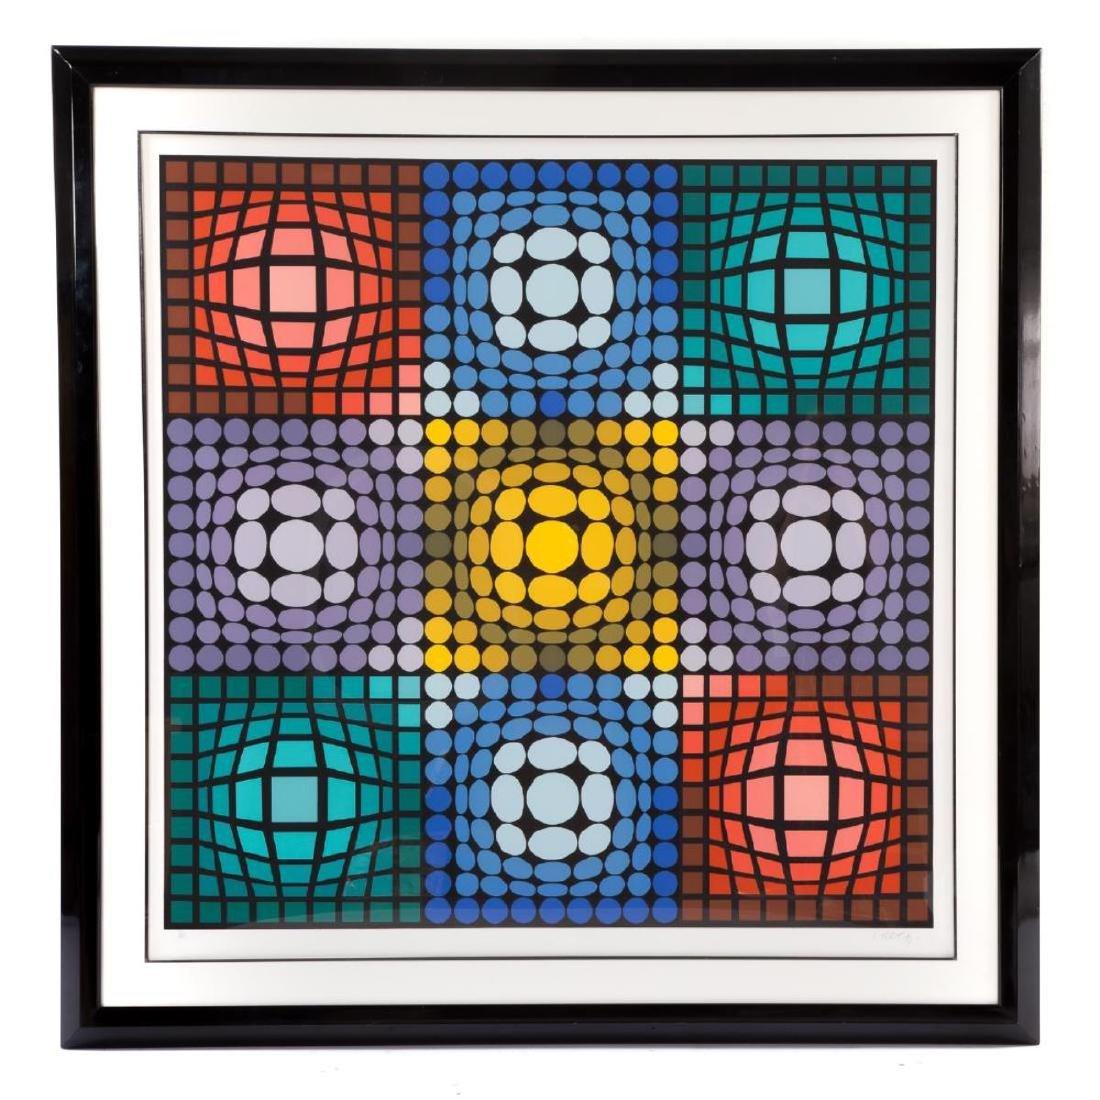 Victor Vasarely - Huge Untitled Op-Art Composition